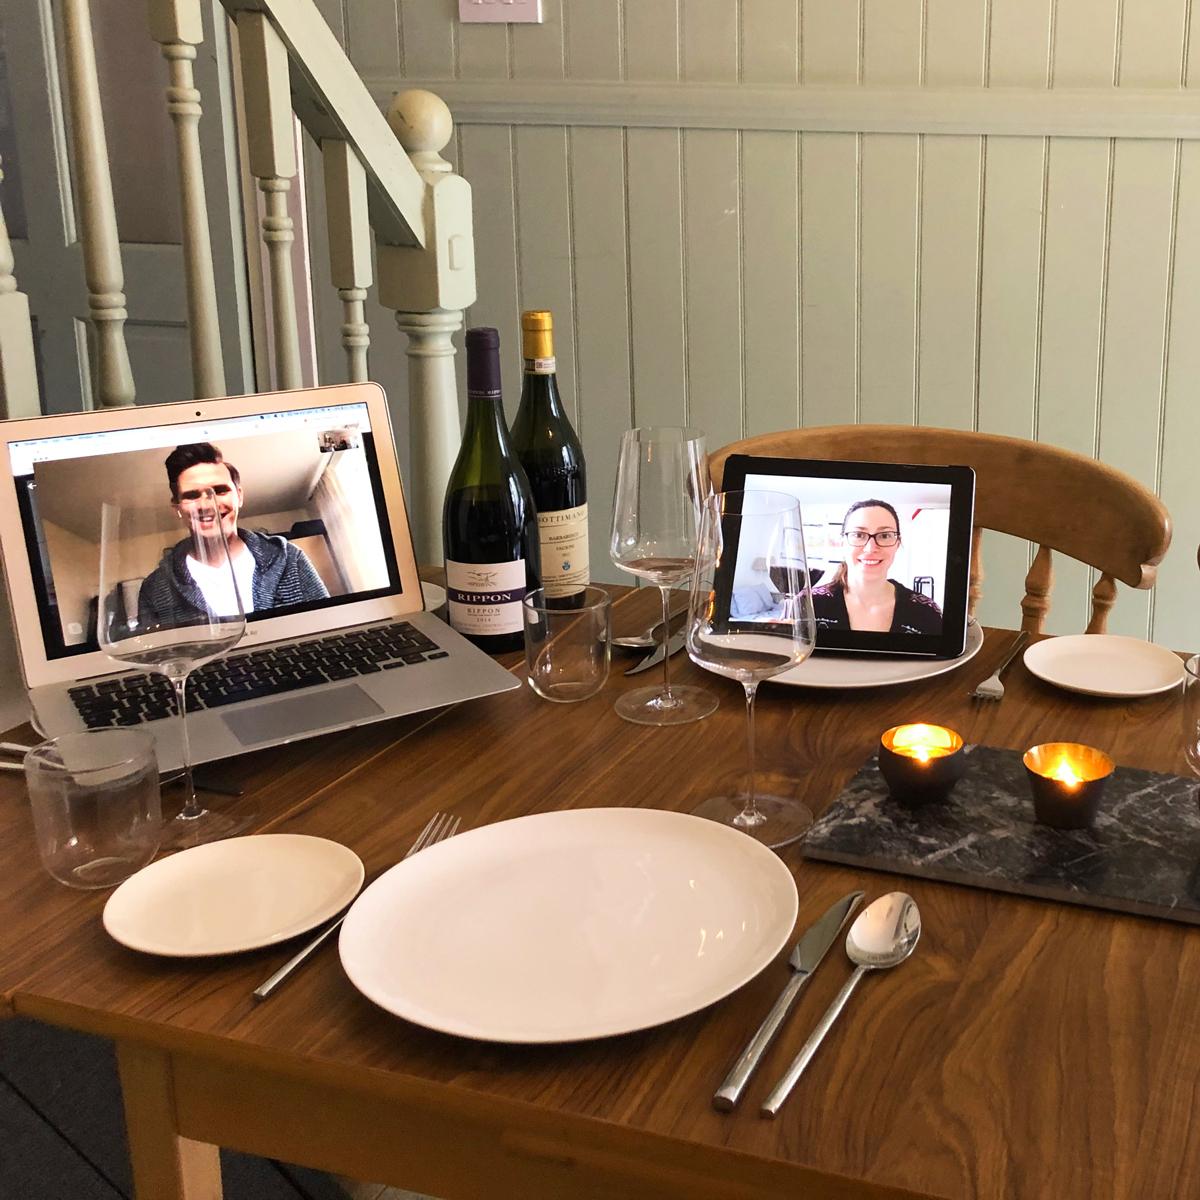 Virtual dinner party